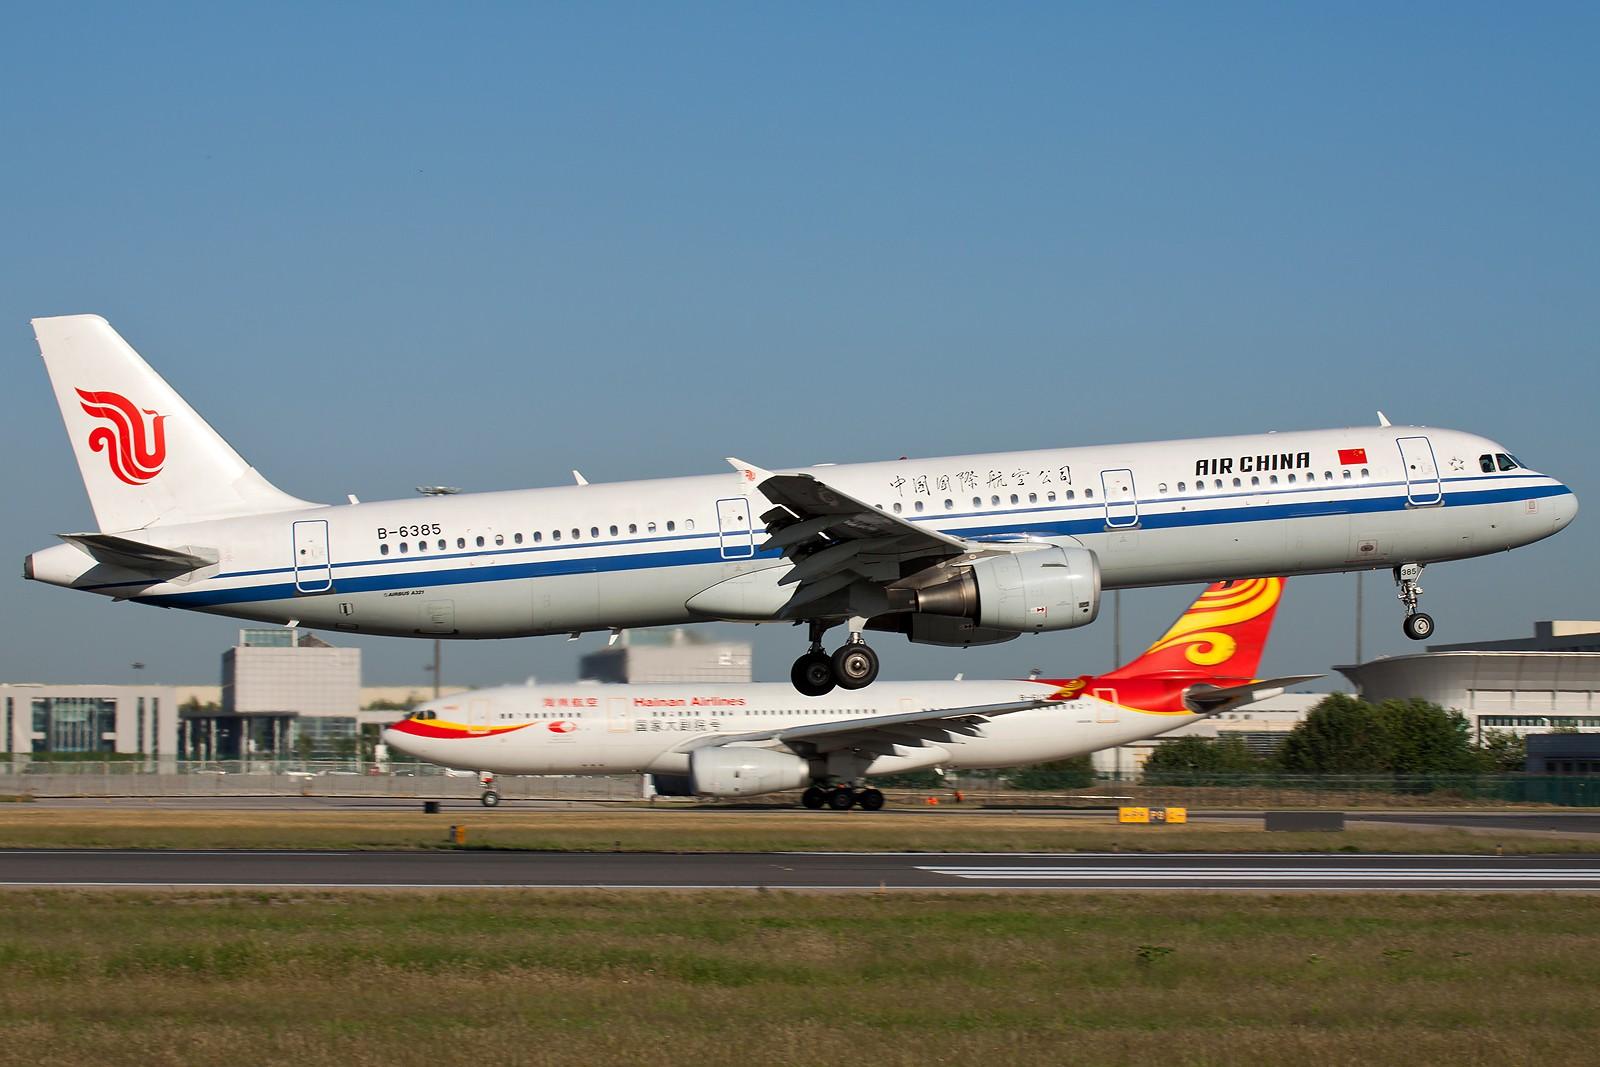 Re:[原创]国航一组 B737&A320系列 [10pics] AIRBUS A321-200 B-6385 中国北京首都机场